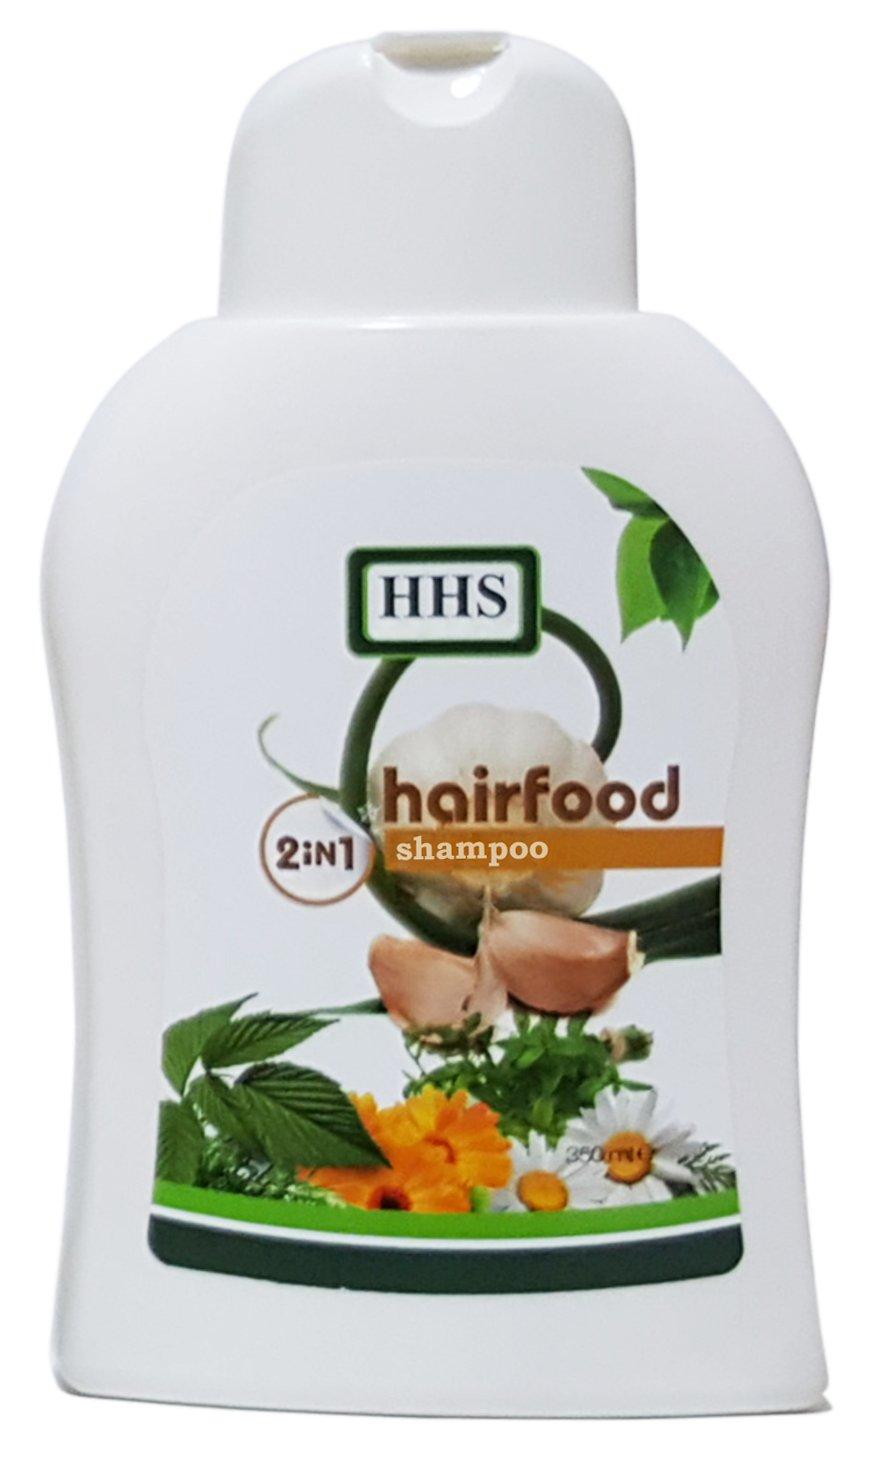 Hairfood shampoo